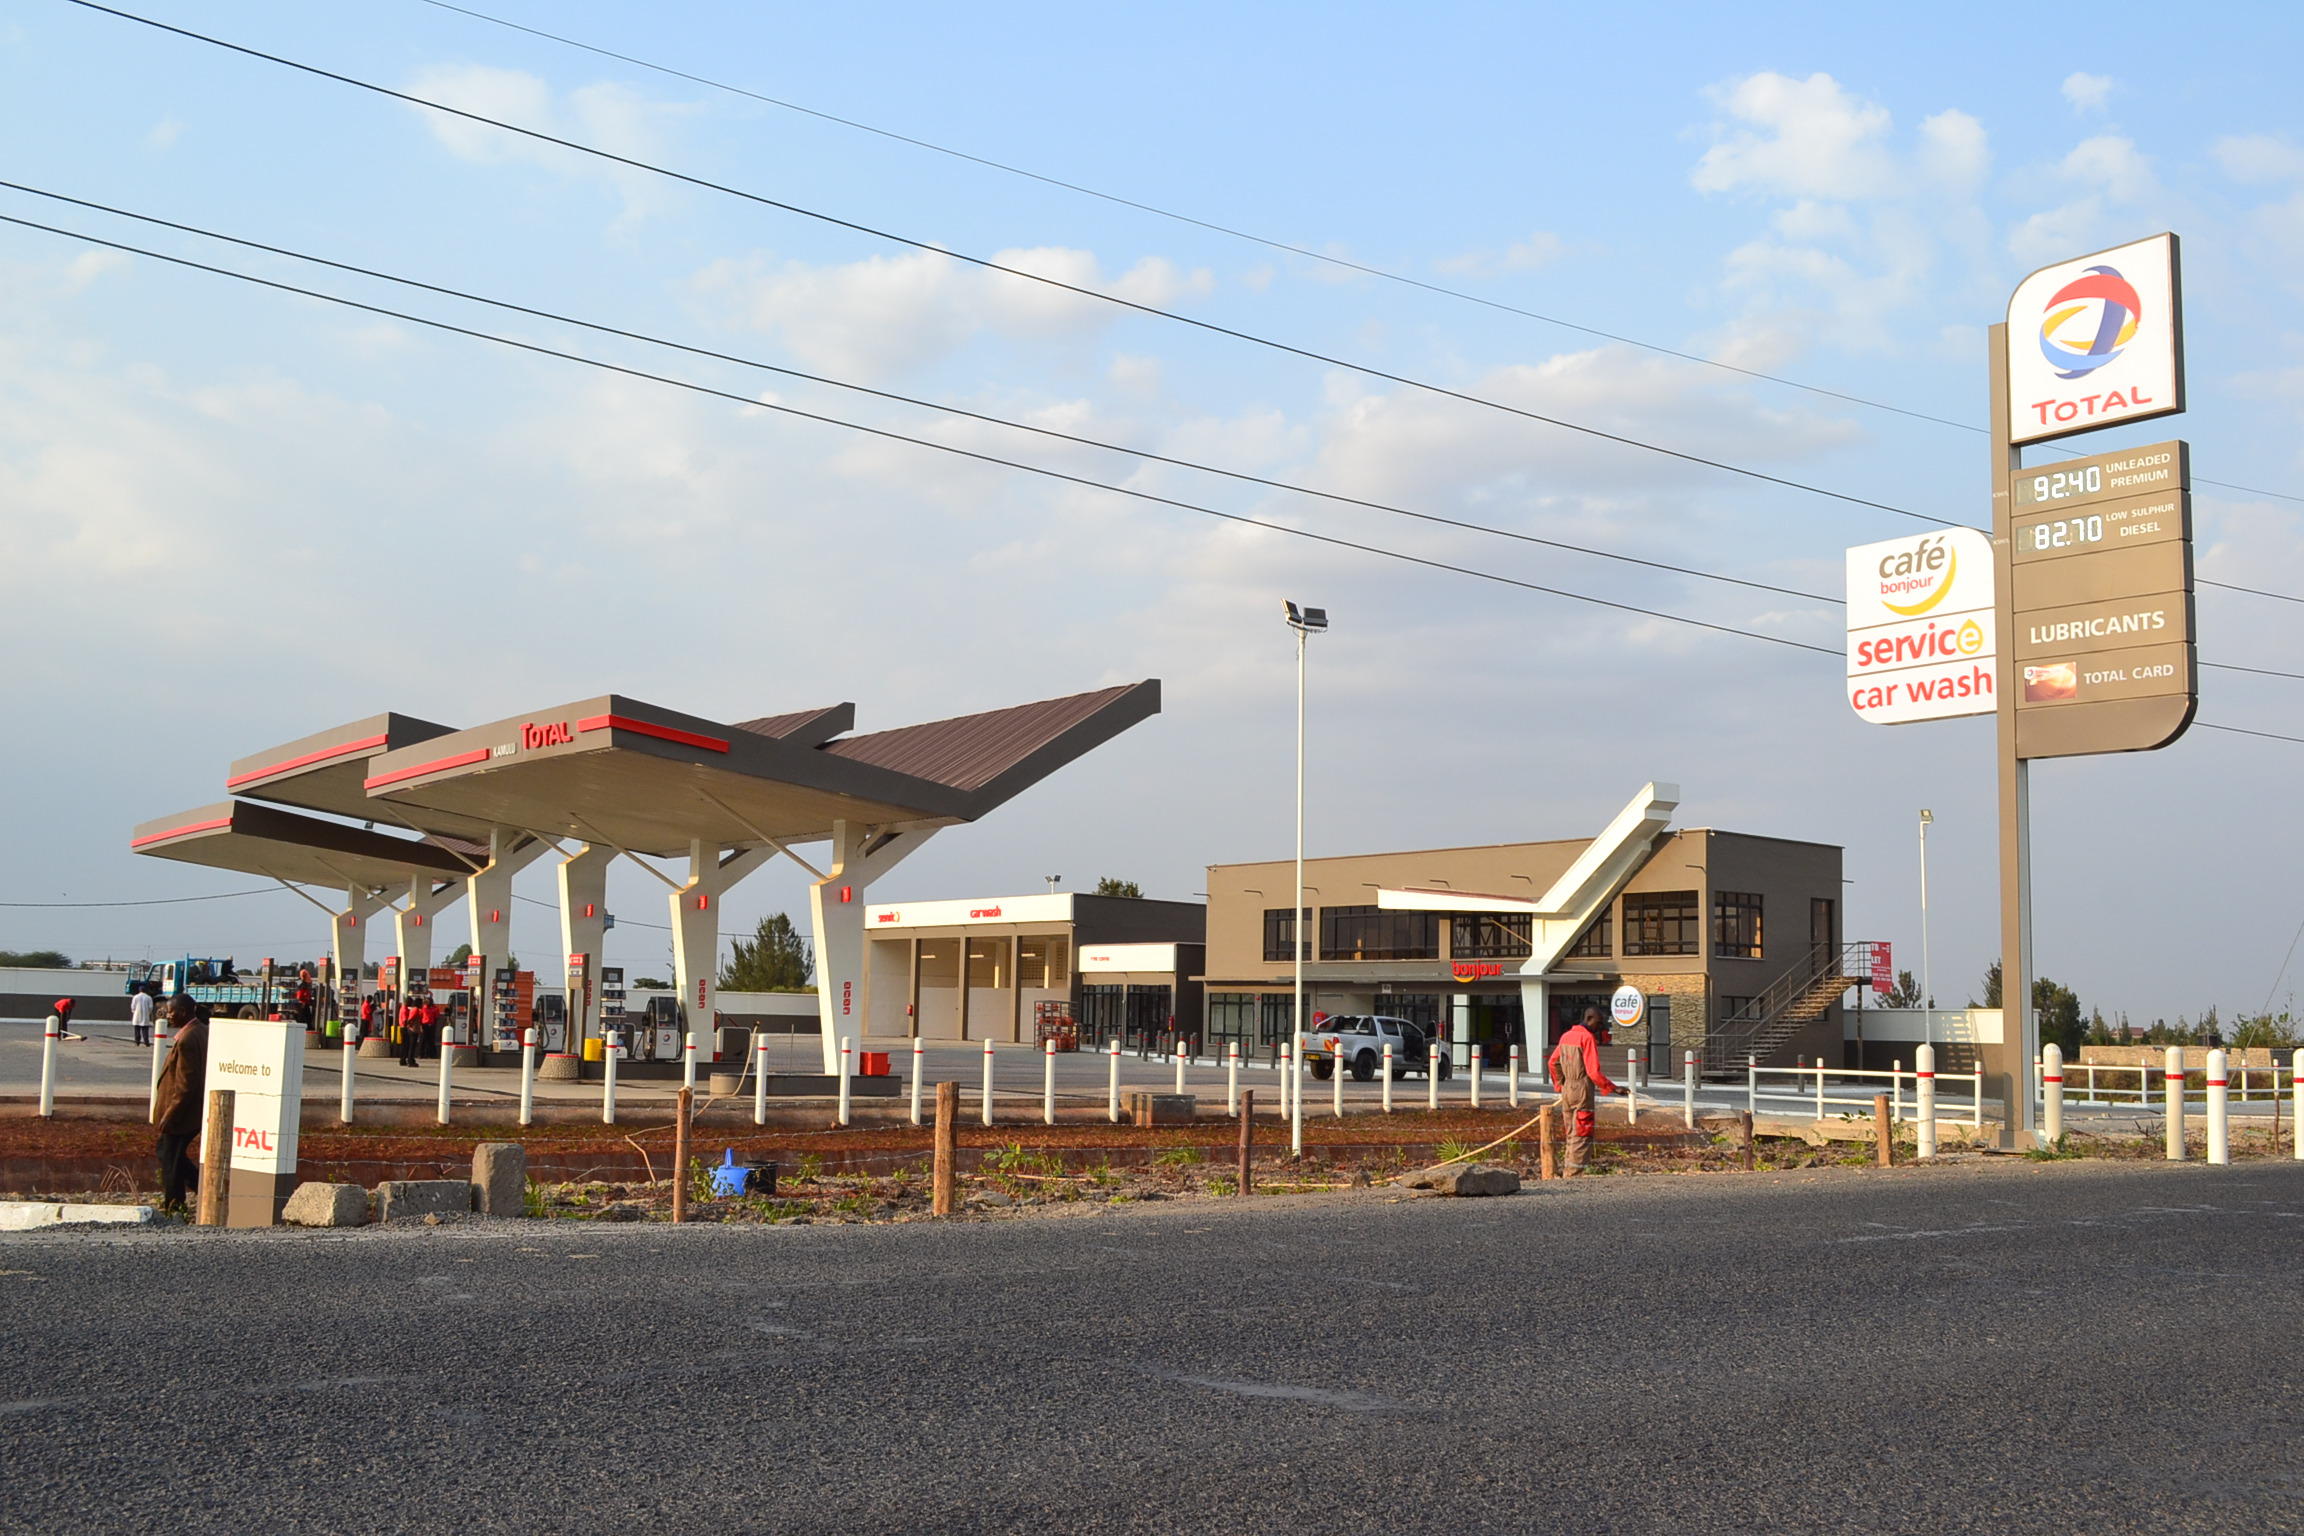 Total Kamulu service station